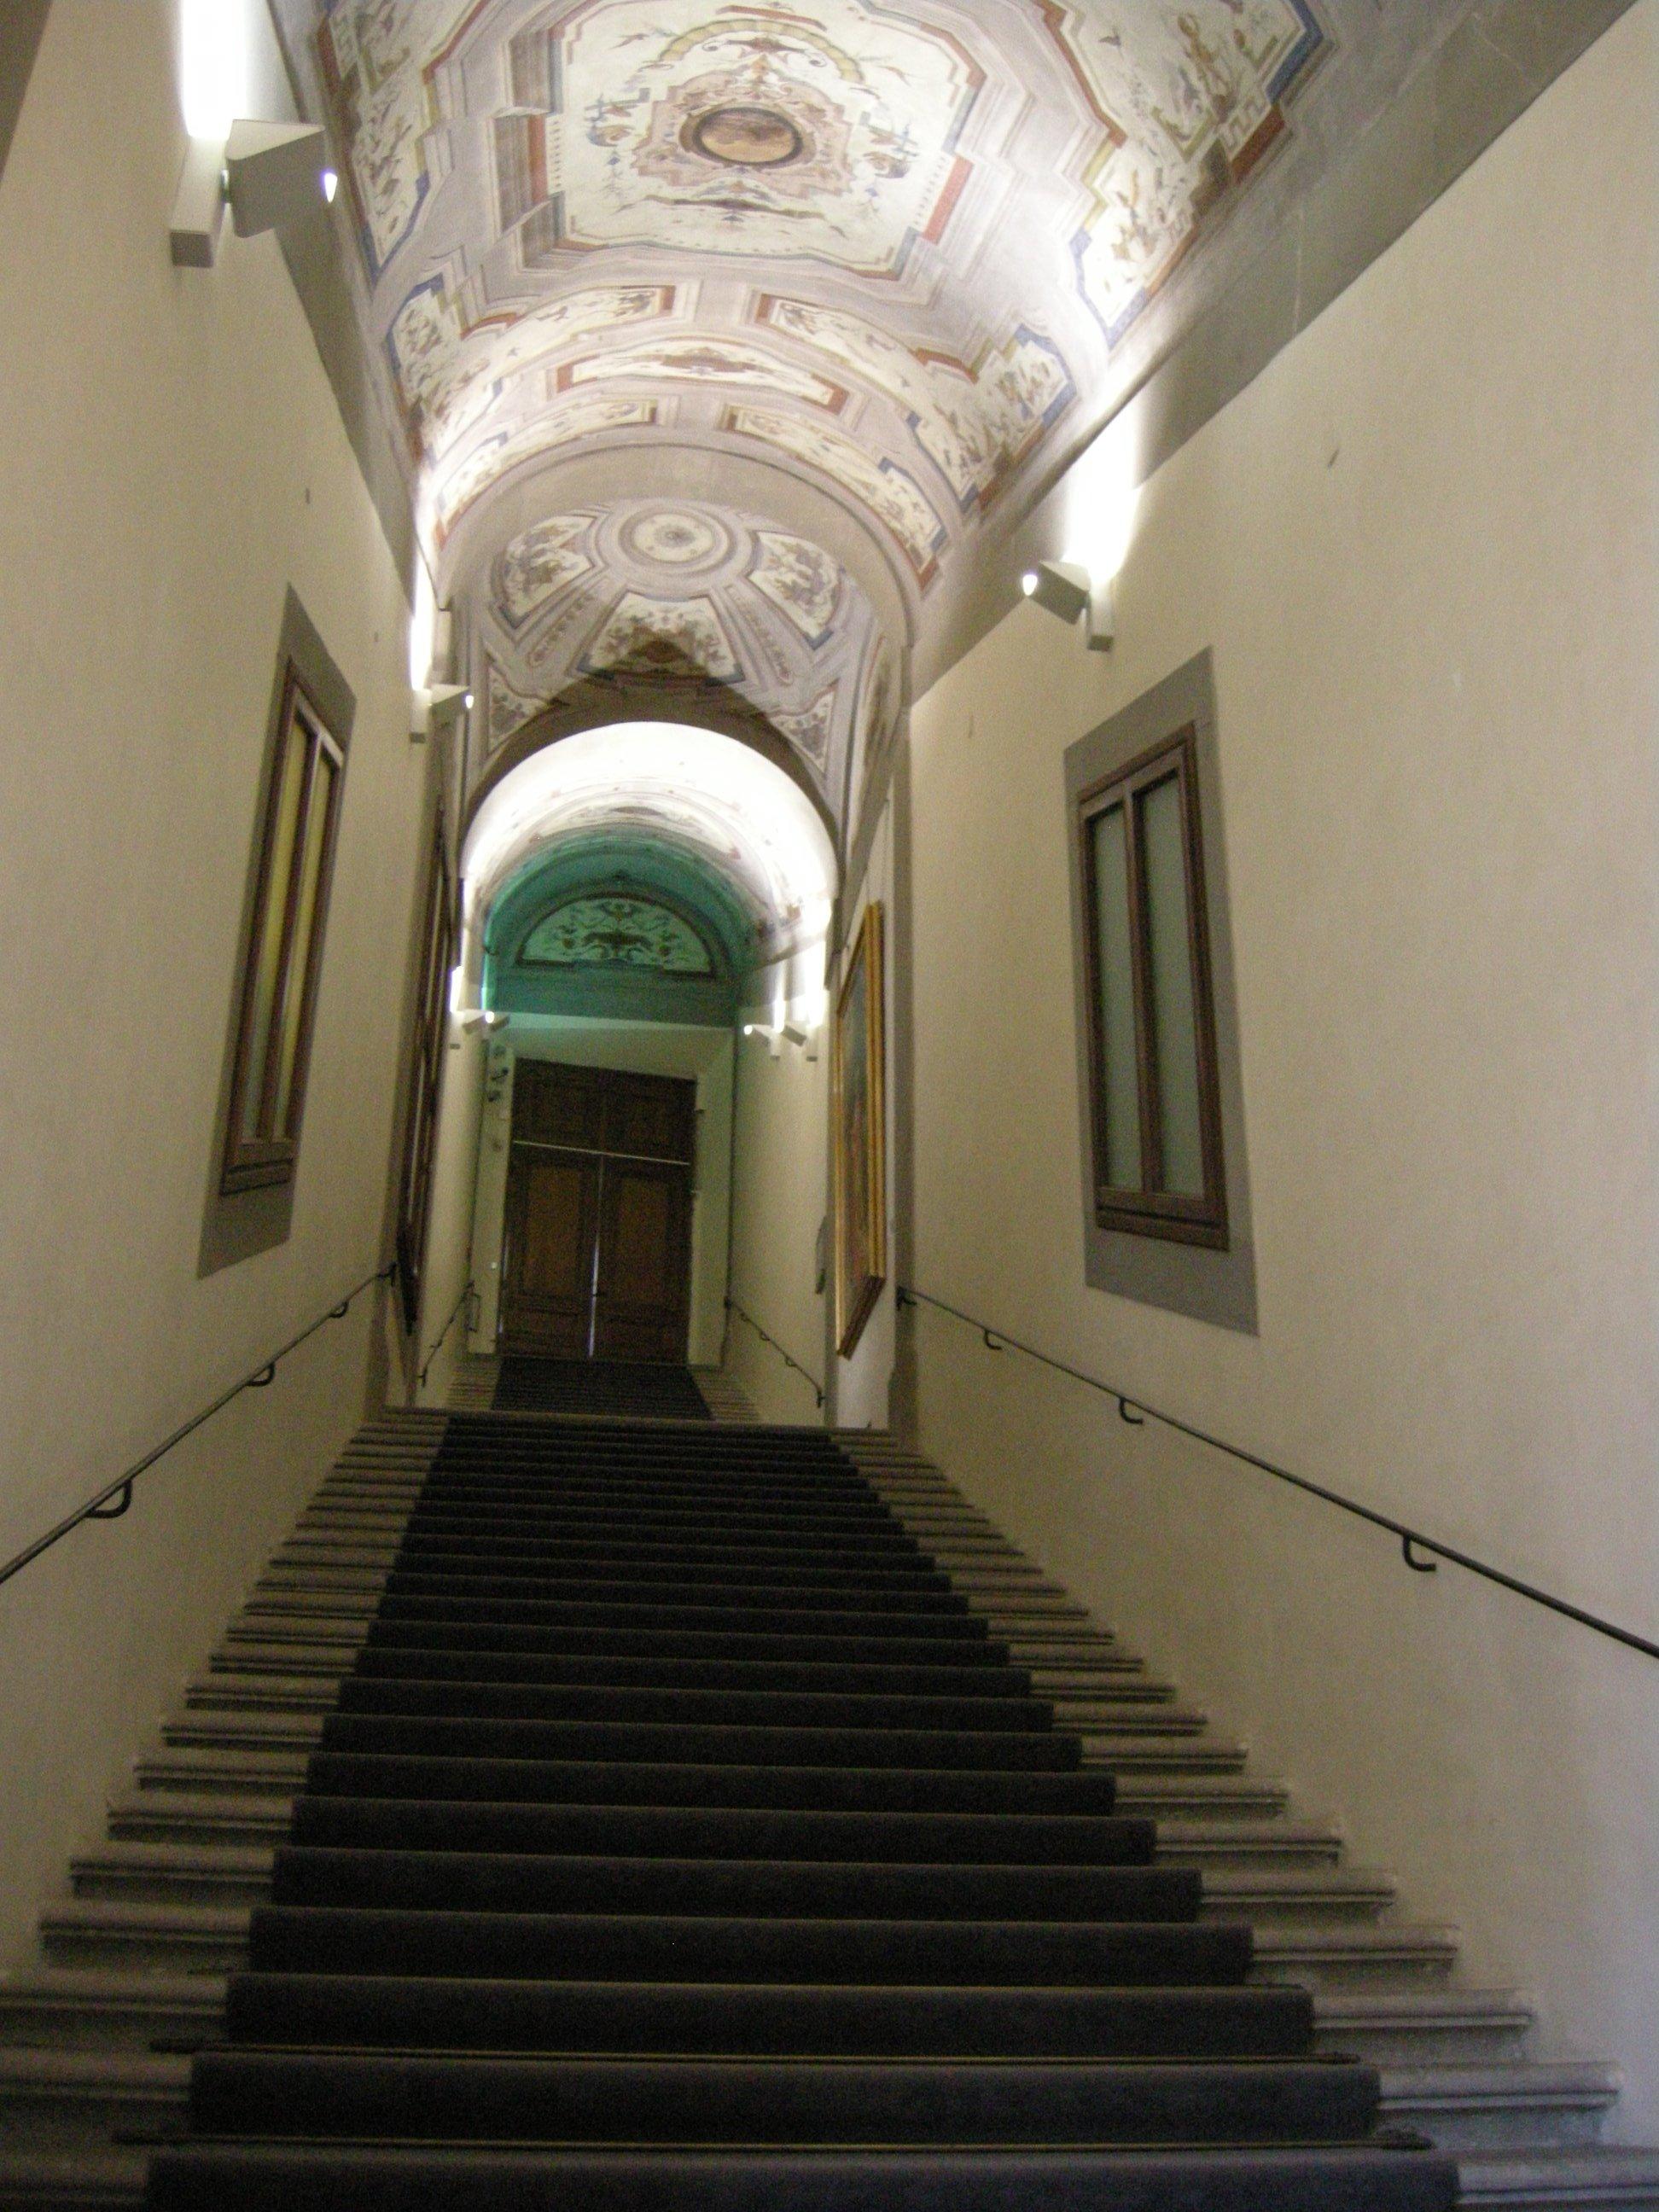 Inside the vasari corridor a journey through vasari - Corridor entrance ...